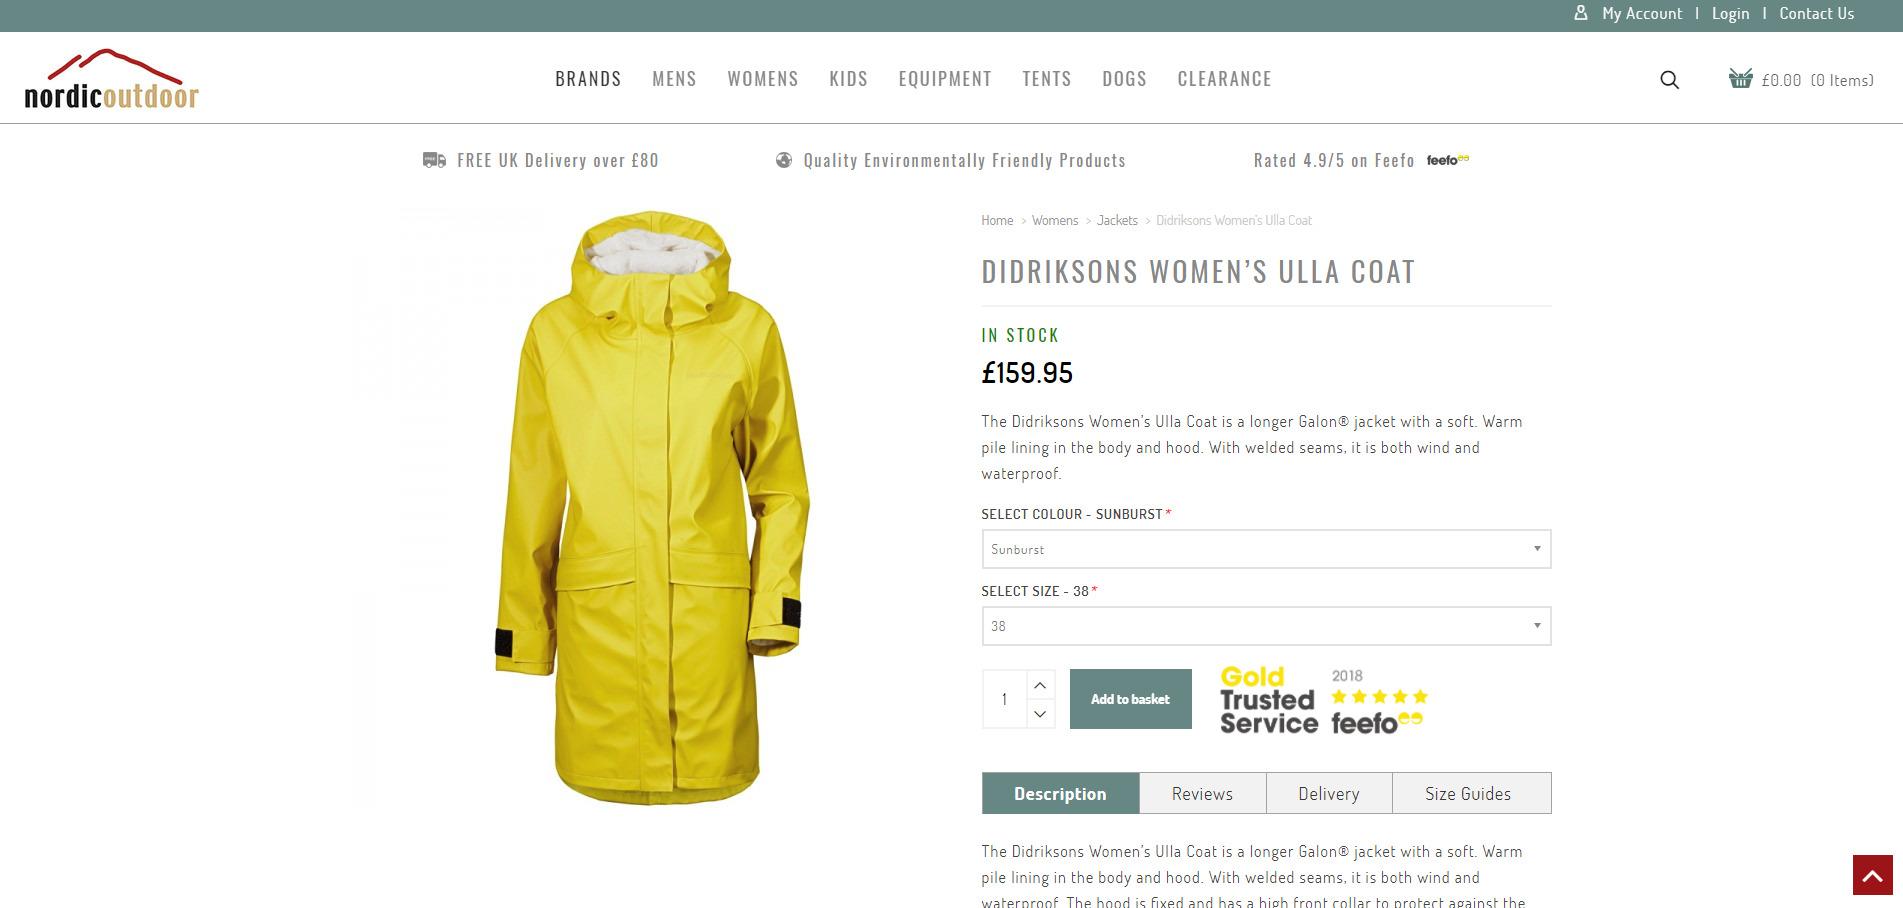 Didriksons-Women's-Ulla-Coat-Wind-Waterproof-Galon®-Jacket-Nordic-Outdoor